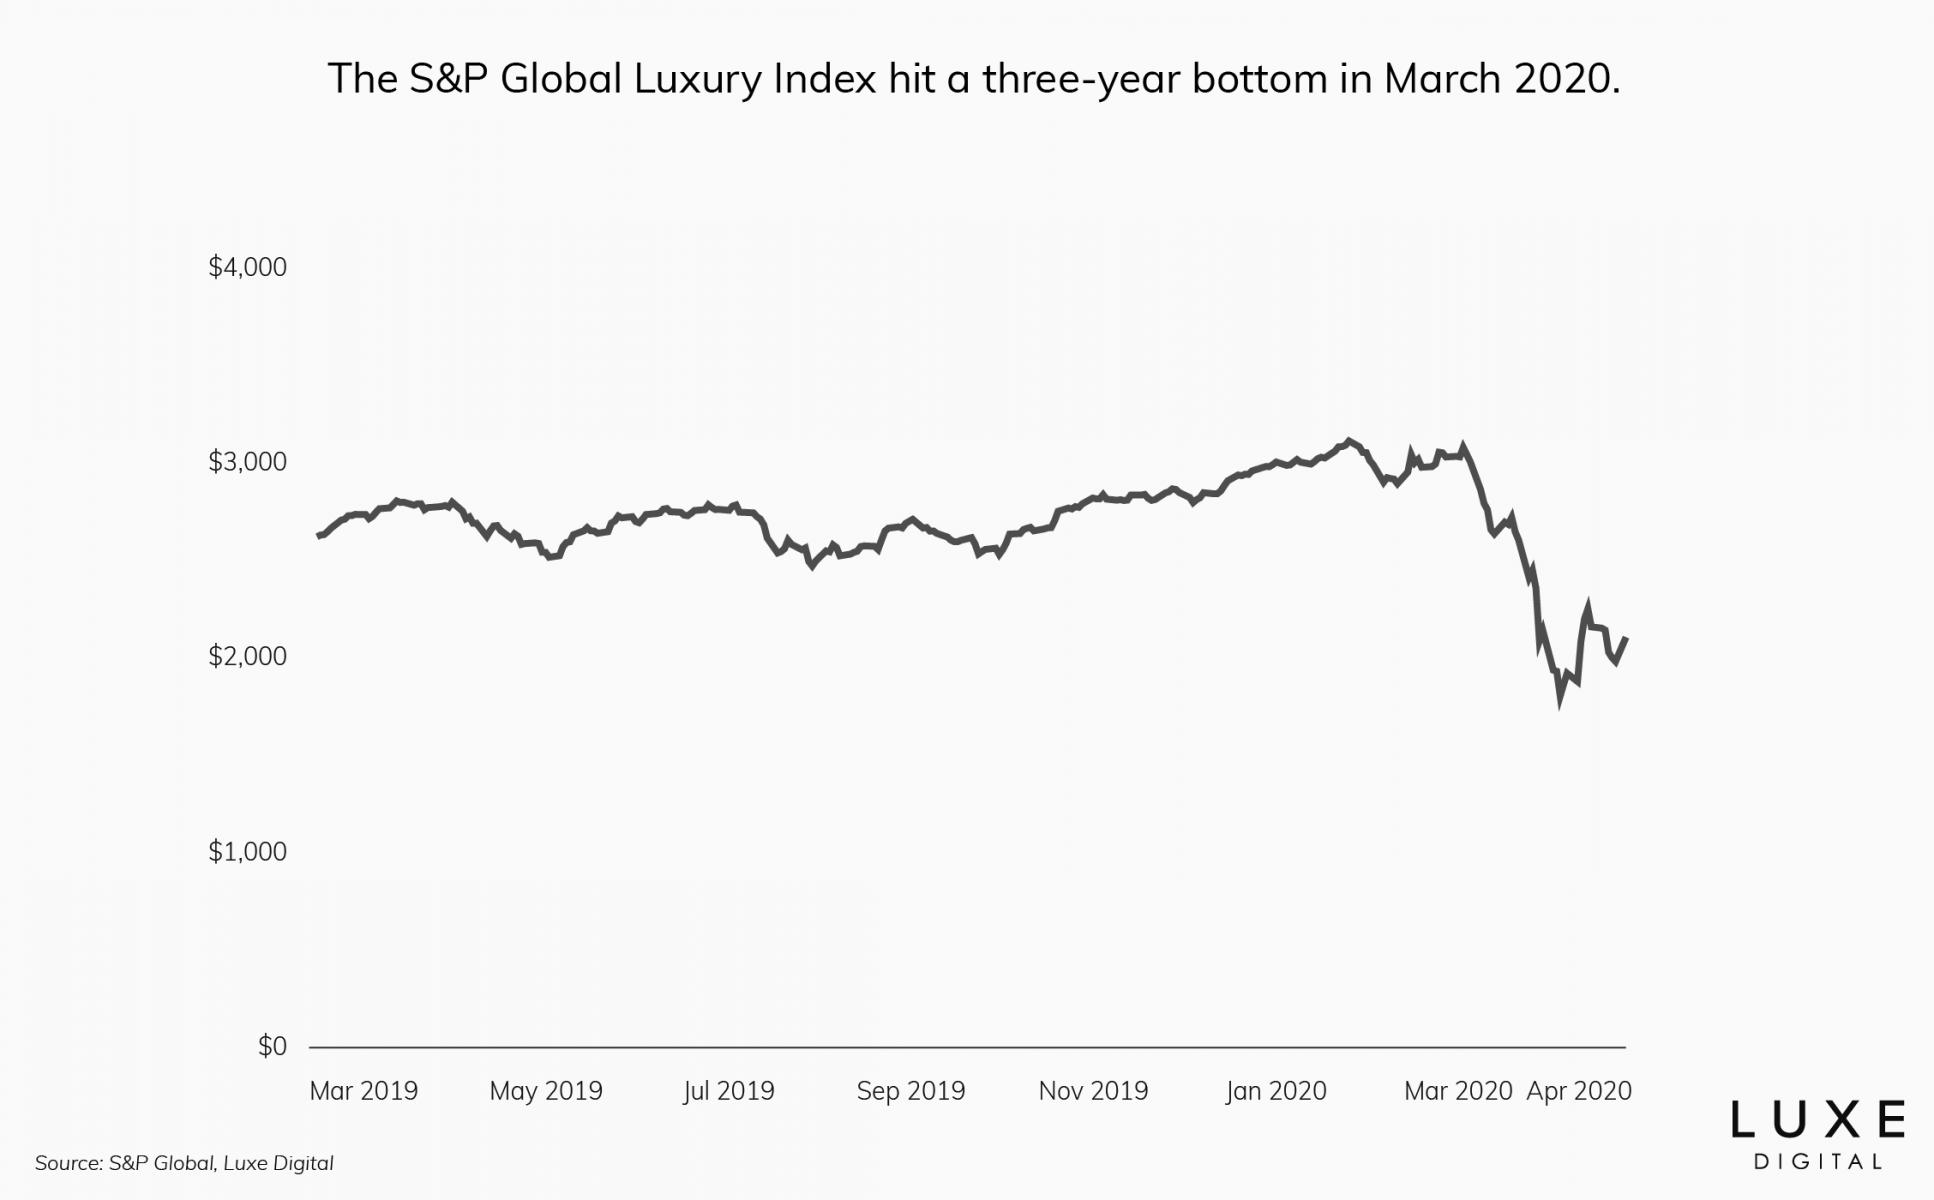 S&P Global Luxury Goods Index performance - Luxe Digital